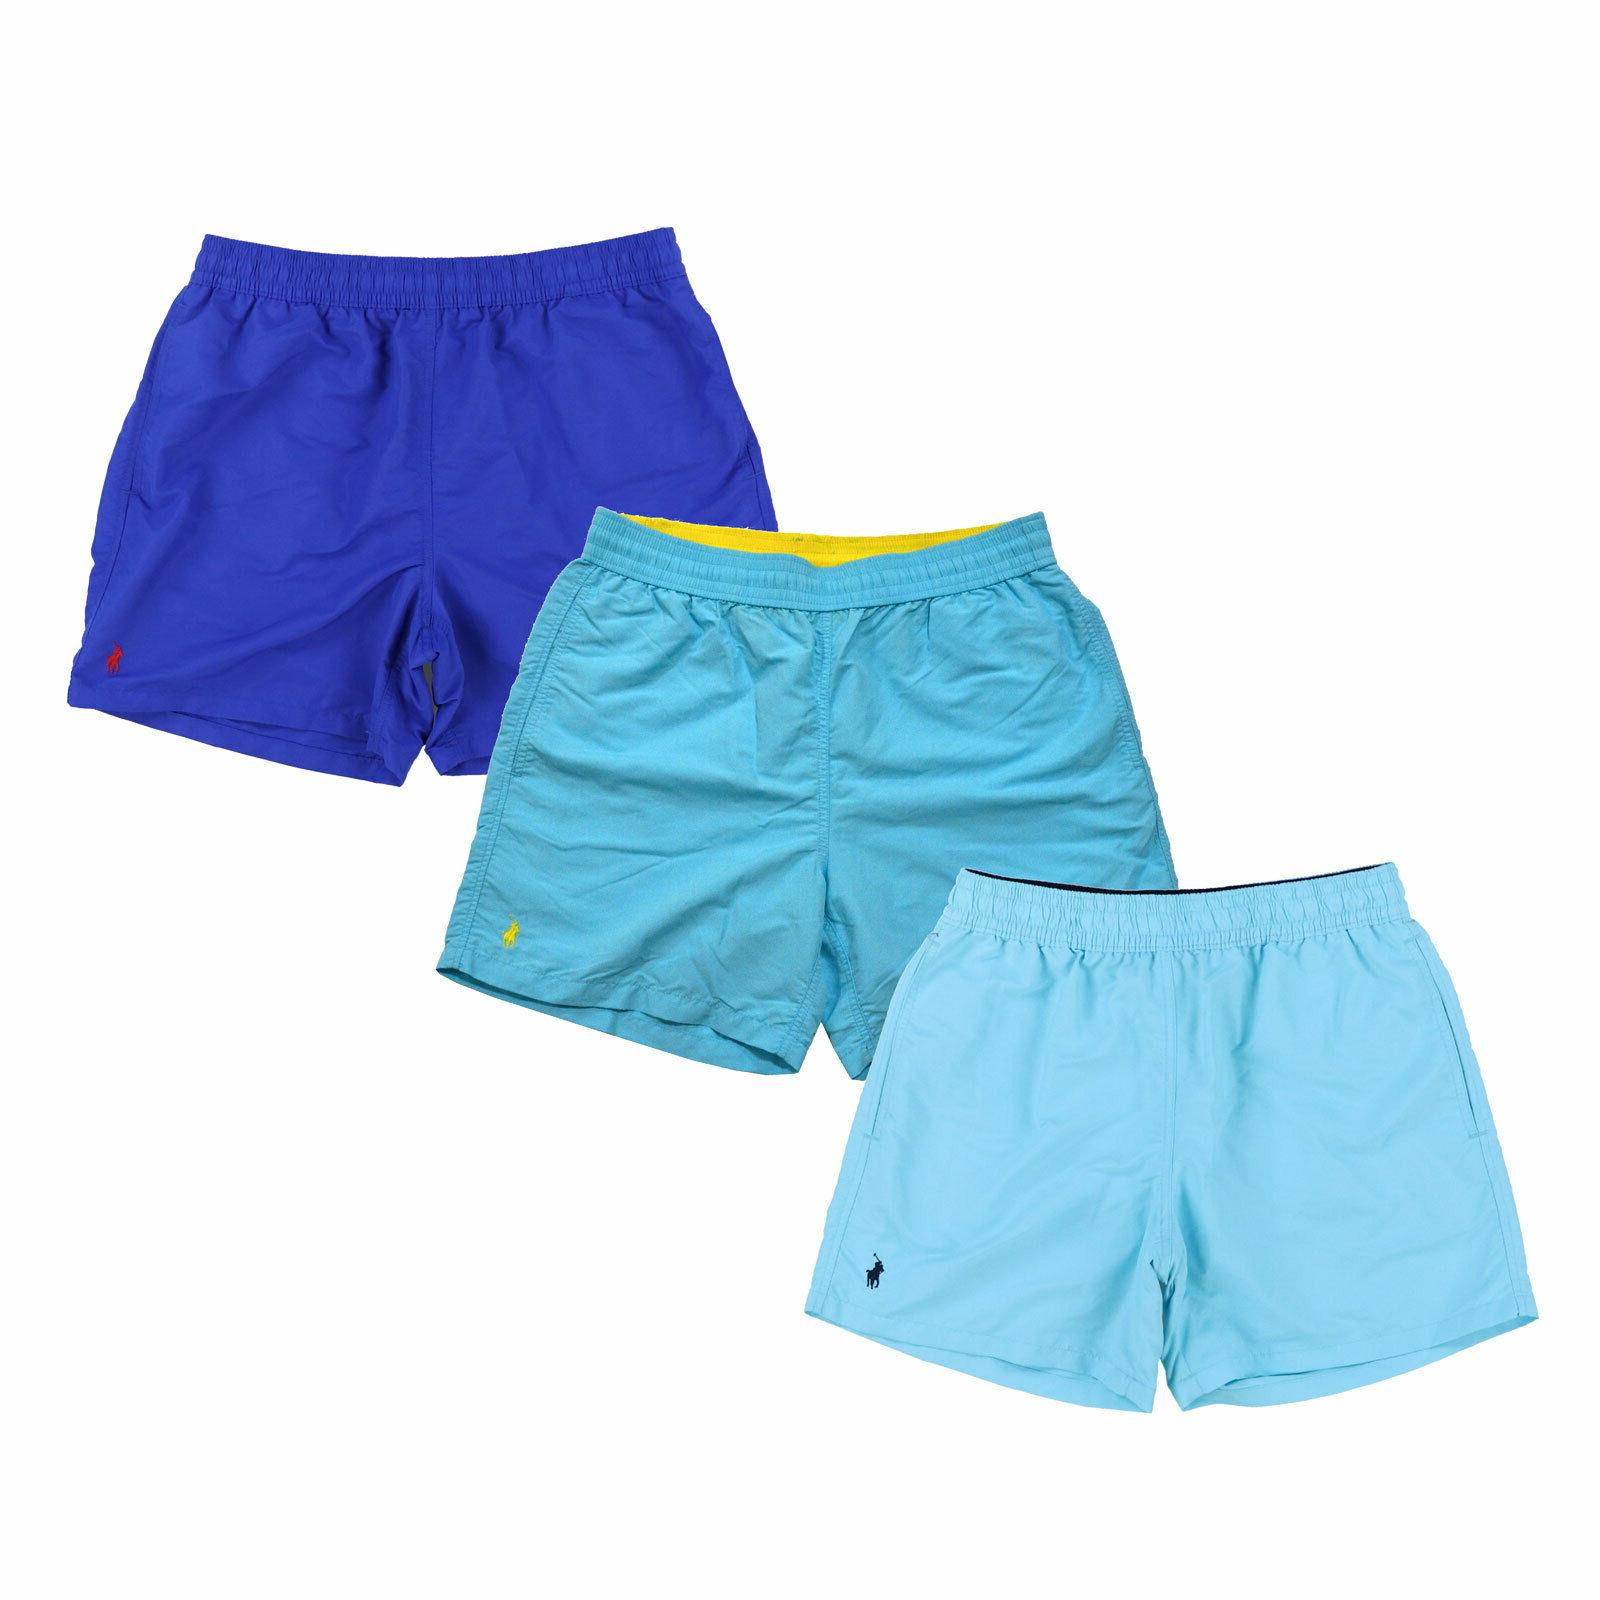 mens bathing suit bottoms lined swim trunks